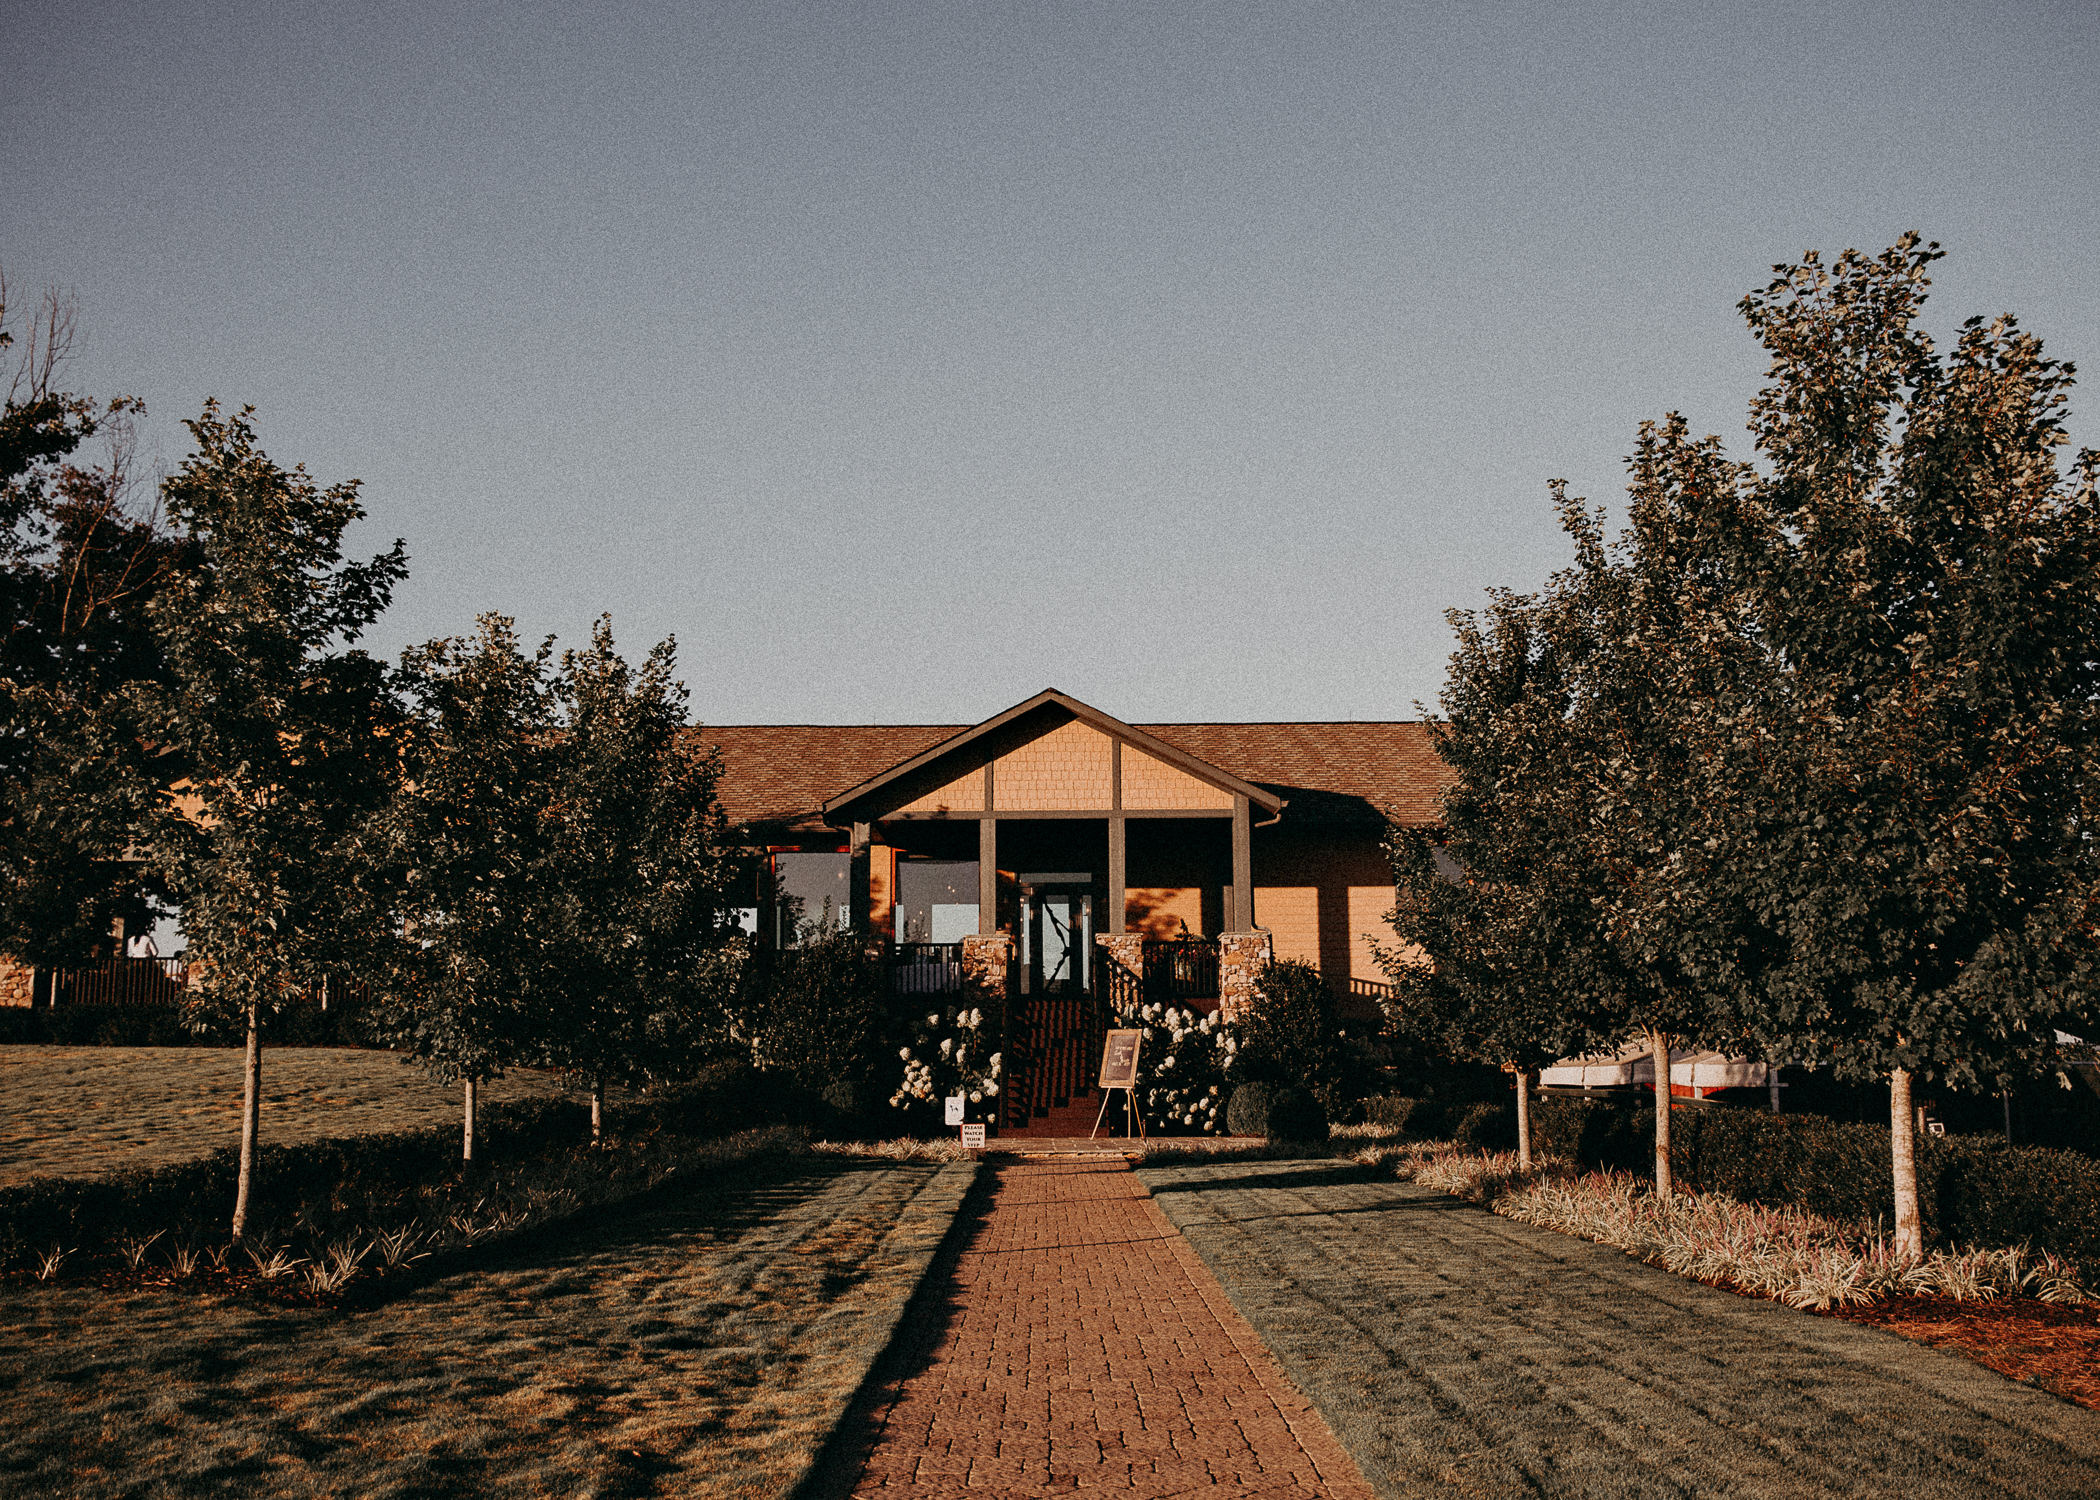 59- Kaya_vineyard_dahlonega_wedding_venue_bride_groom_portraits_aline_marin_photography.jpg